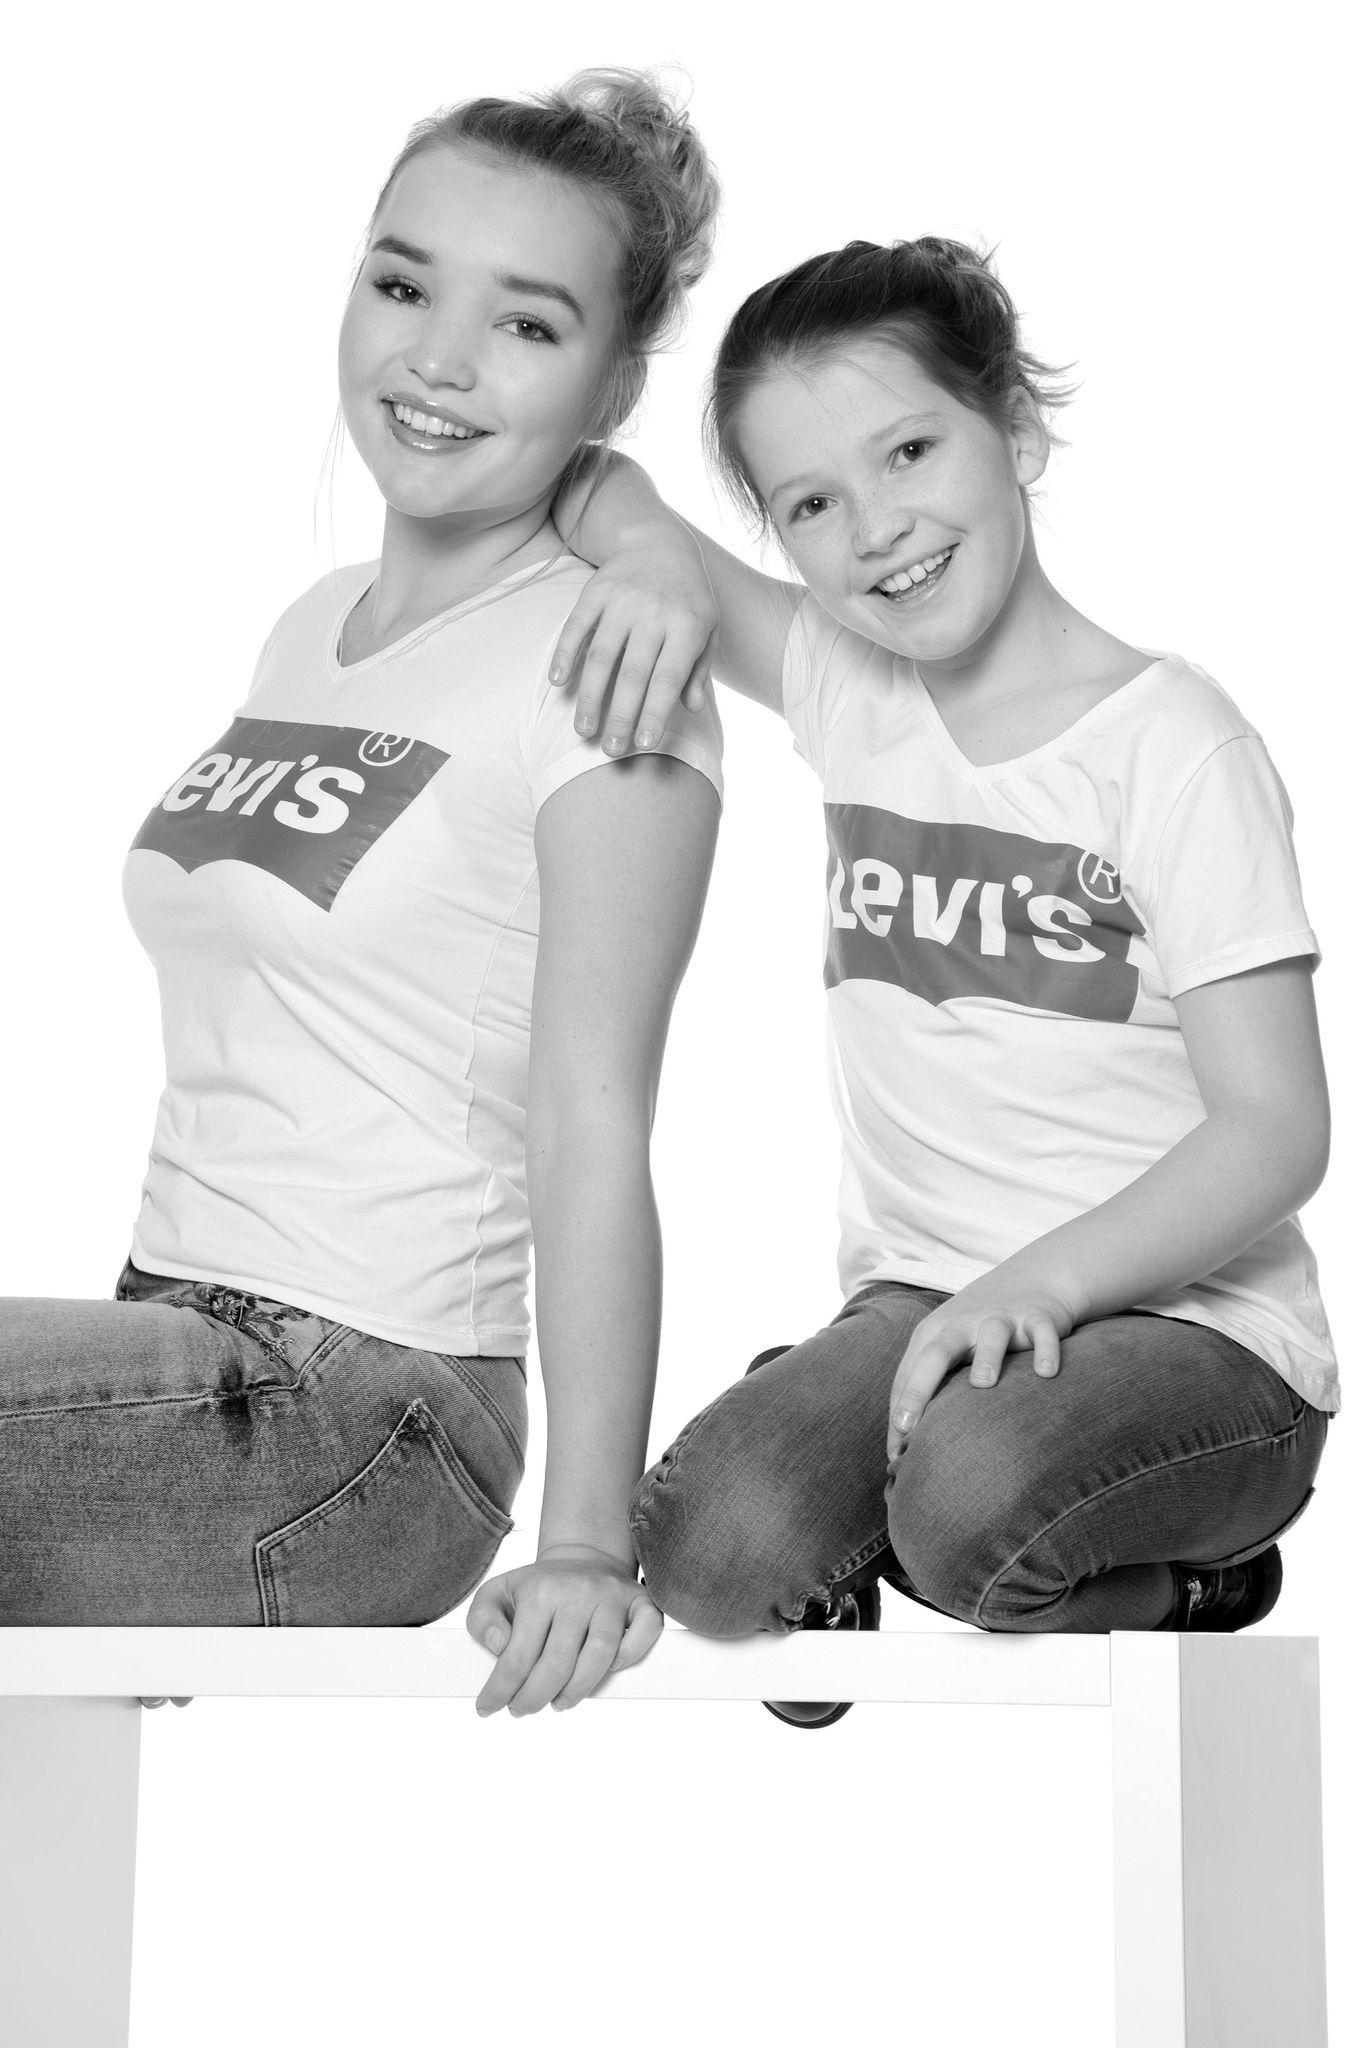 teens, teensfotografie, freunde, kinder, kinderfotografie, familienfotos, babybauch, baby, newborn, babyzeit, kids, familie, babyfotos, kinderfotos, kinderlachen, @arleneknipperberg, portraitfotografie, produktfotografie, bewerbungsfotos, portraitphotography, businessfotografie, fotostudio, shooting, portrait, fotografin, fotograf, fotografie, foto, fotografenmeisterin, ausgezeichnetefotografie, jena, thüringenproduktfotografie, bewerbungsfotos, portraitphotografie, businessfotografie, fotostudio, shooting, portrait, fotografin, fotograf, fotografie, foto, fotografenmeisterin, ausgezeichnetefotografie, jena, thüringen